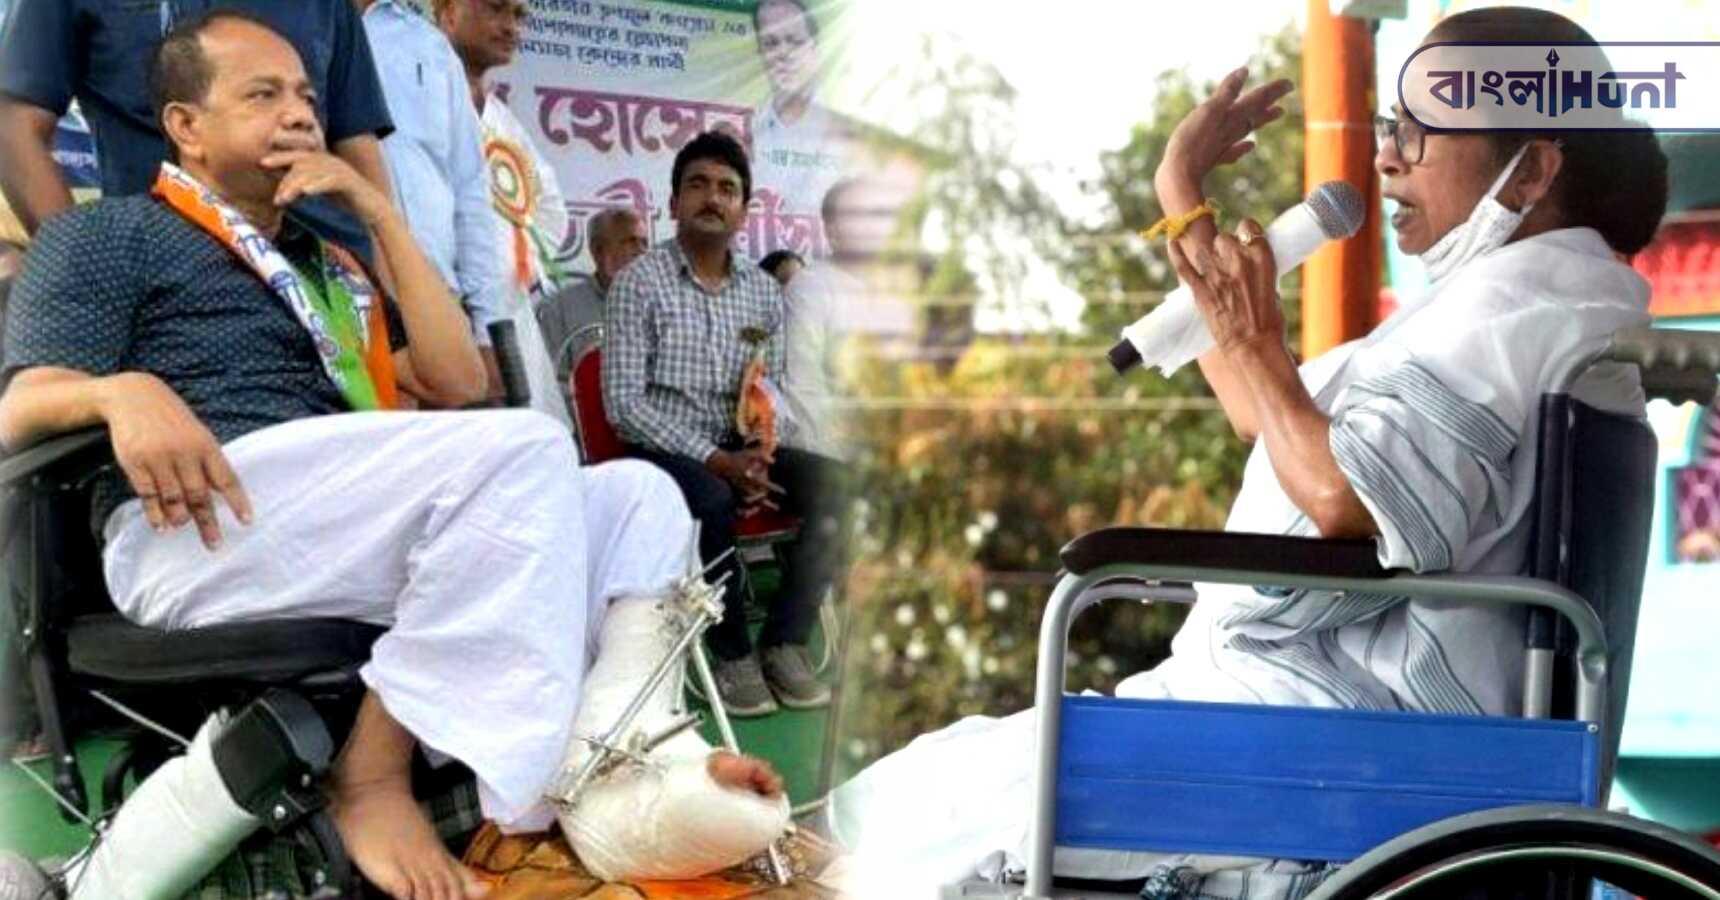 Jakir Hossain is promoting in a wheelchair